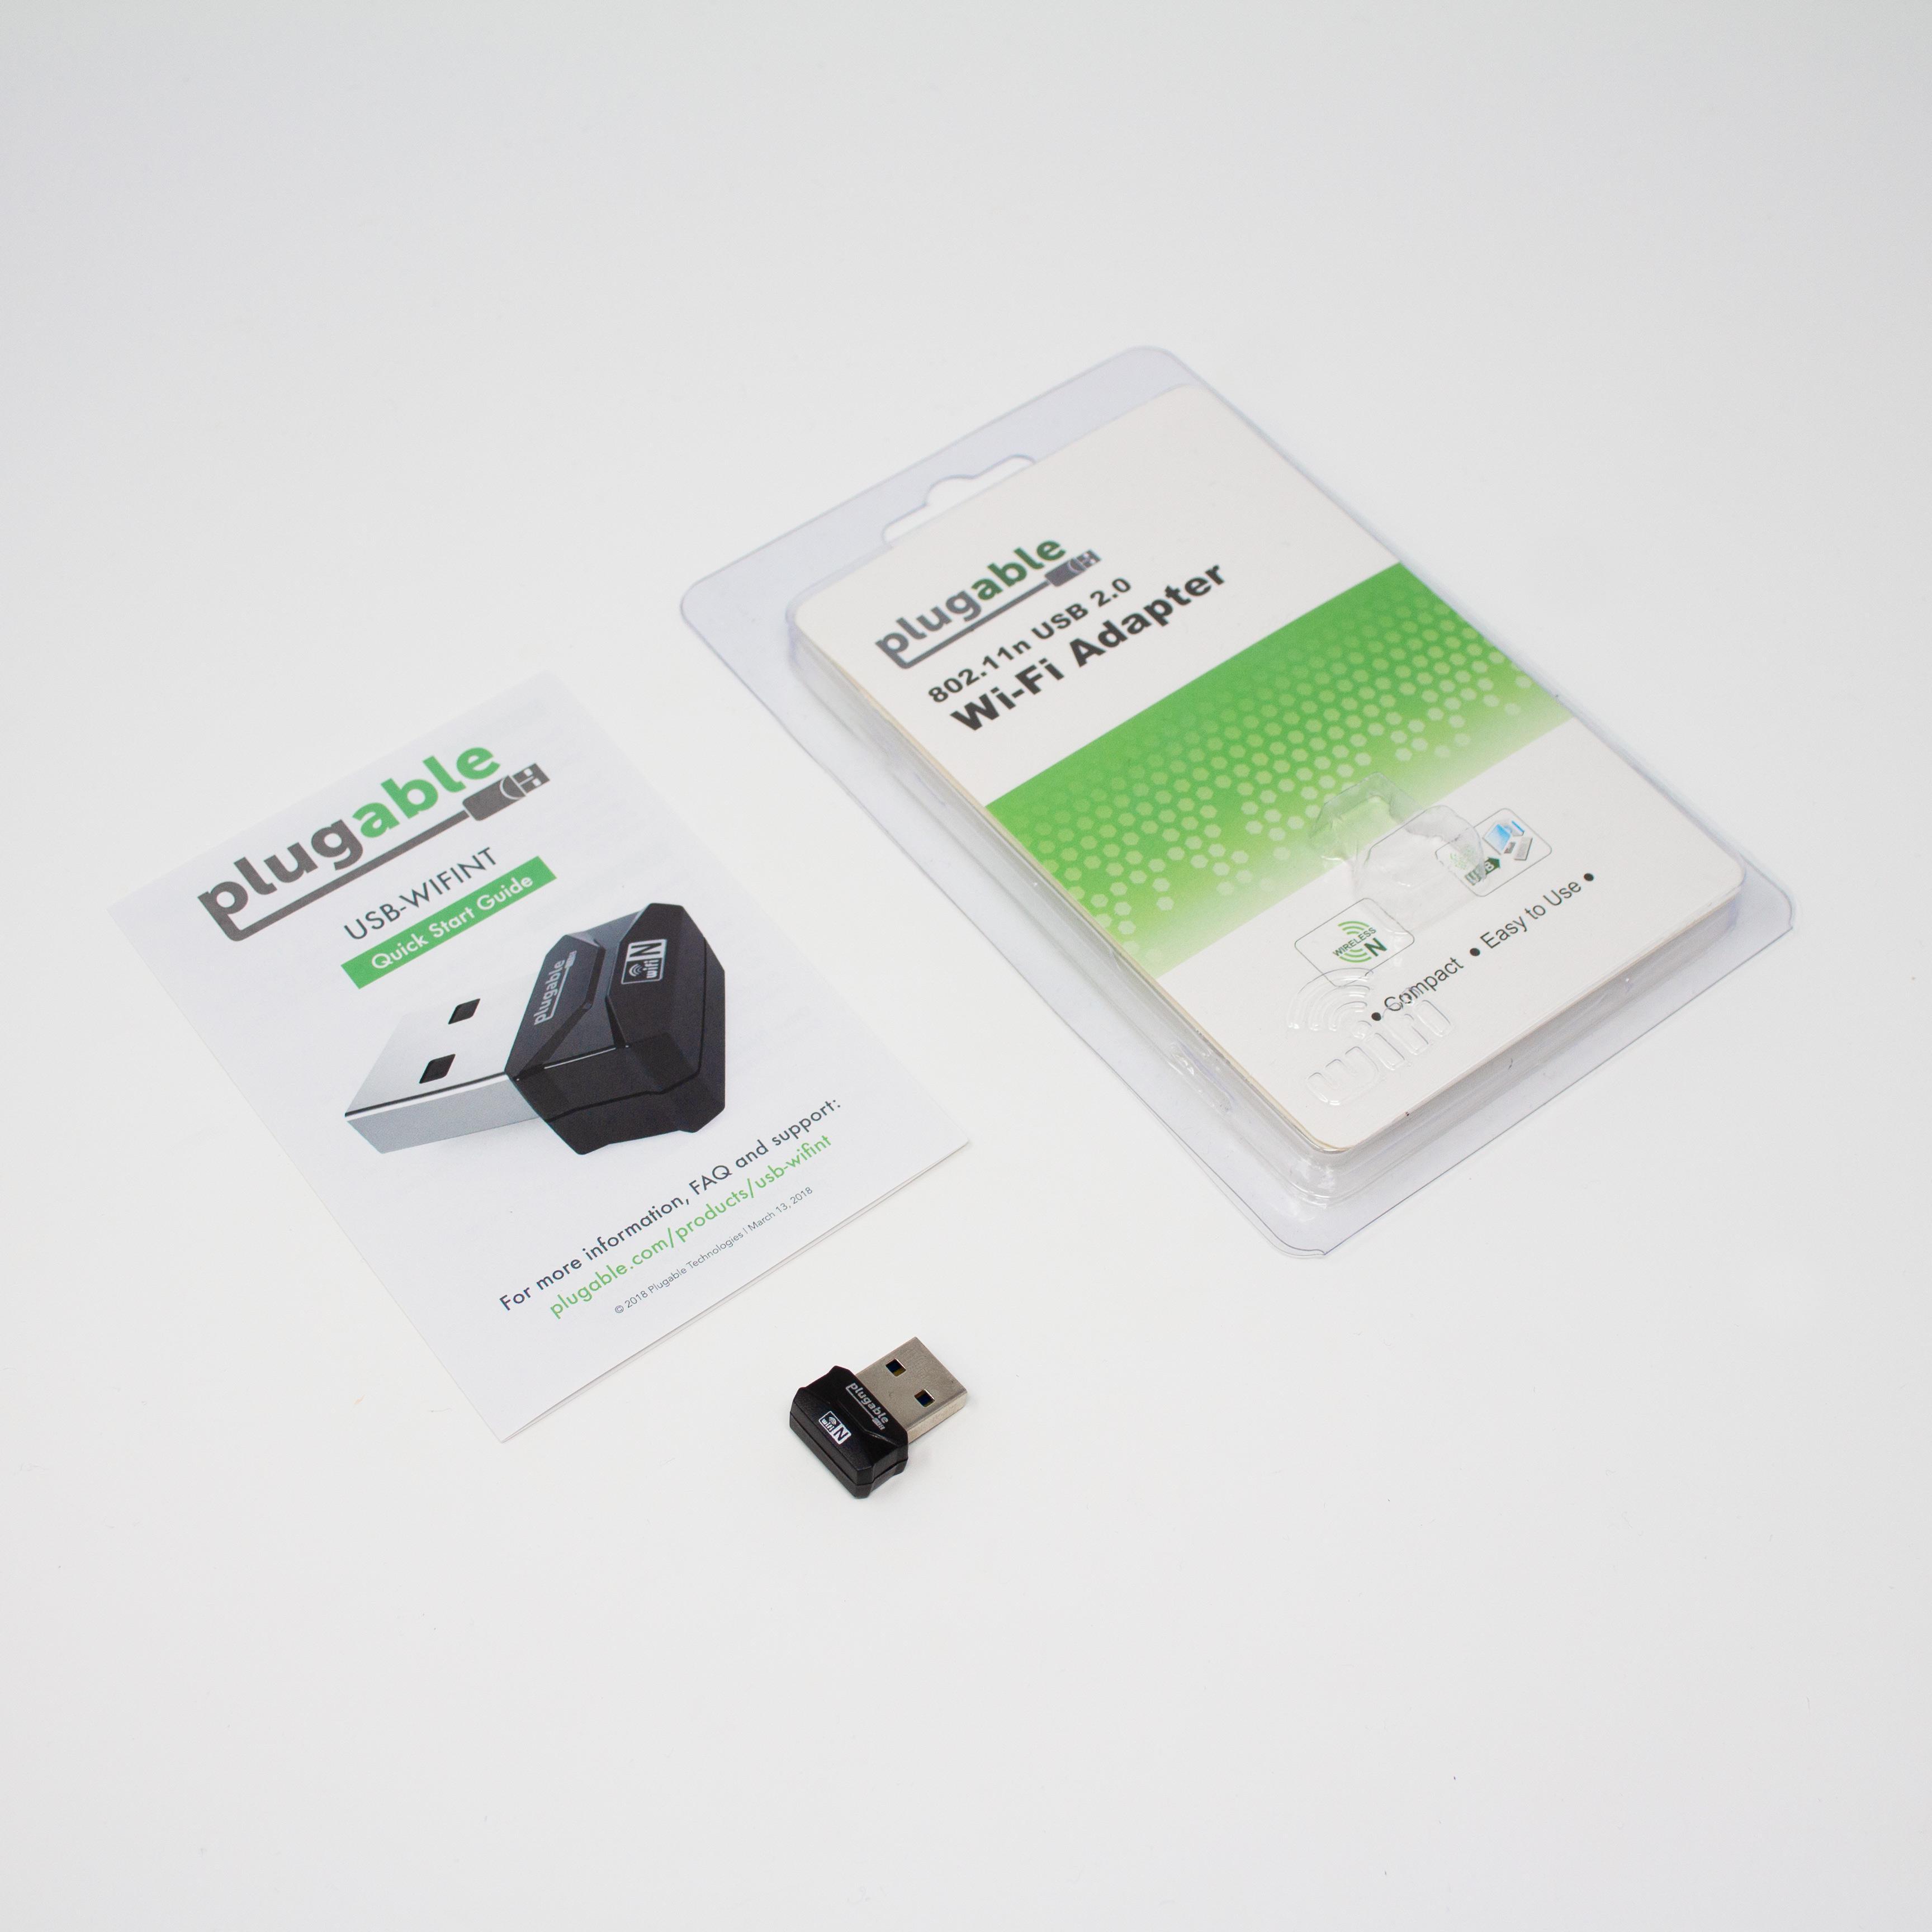 10Pcs, 150M USB Network Adapter for PC Laptop Wireless Network Adapter Uonlytech USB WiFi Adapter